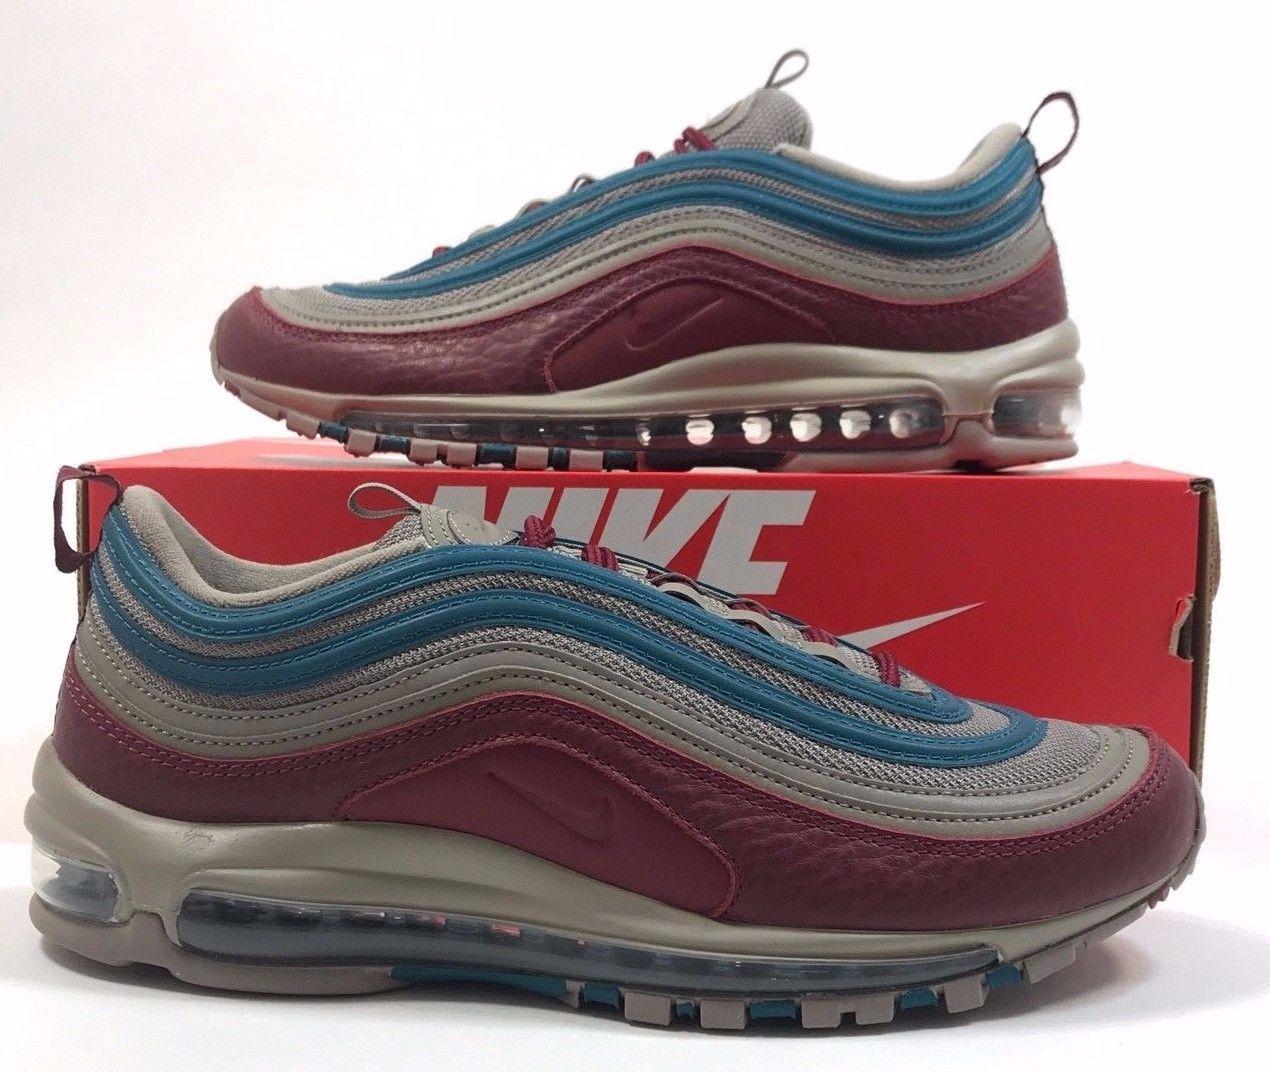 60822233224 Nike Air Max 97 SE